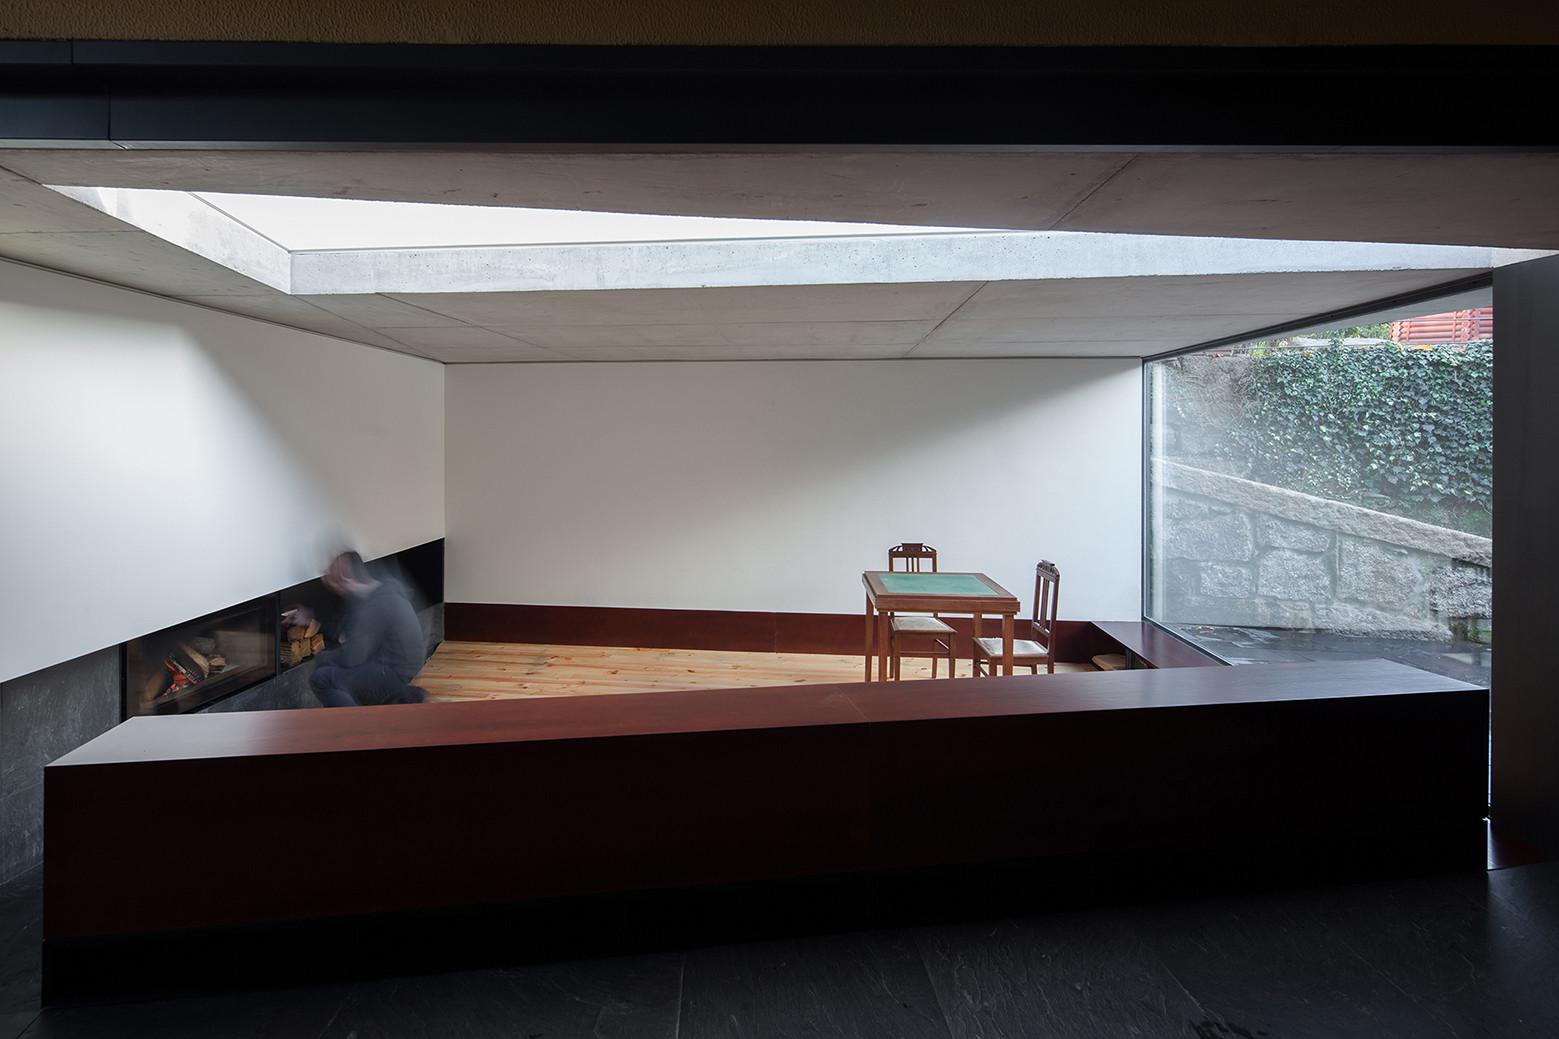 Sala em Pala / Nuno Melo Sousa, © José Campos